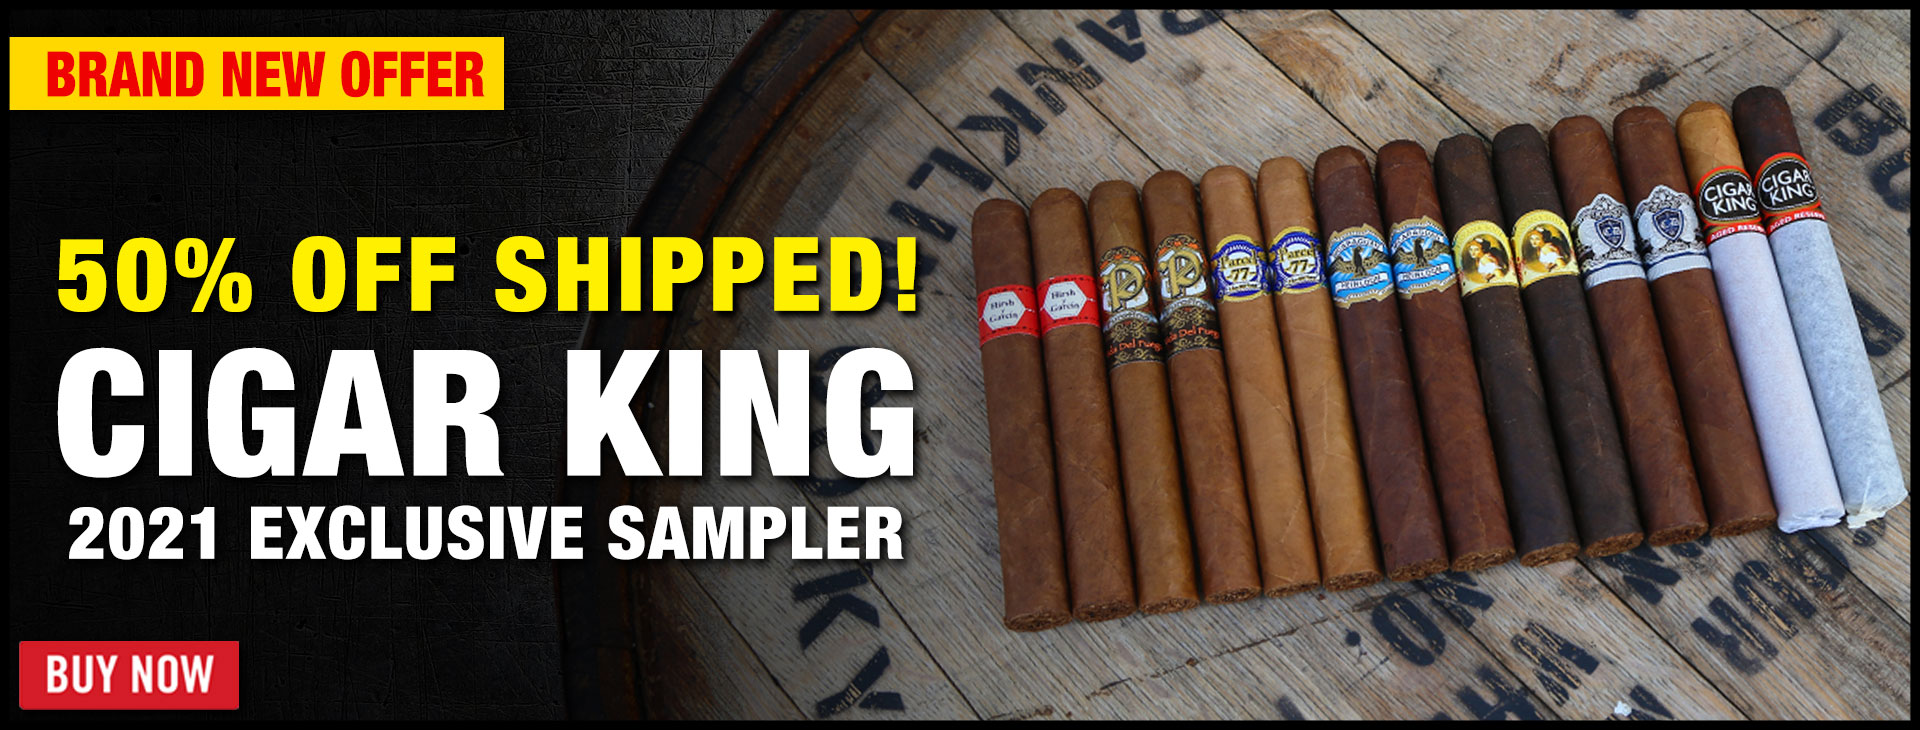 cigar-king-2021-exclusive-sampler-2021-banner.jpg